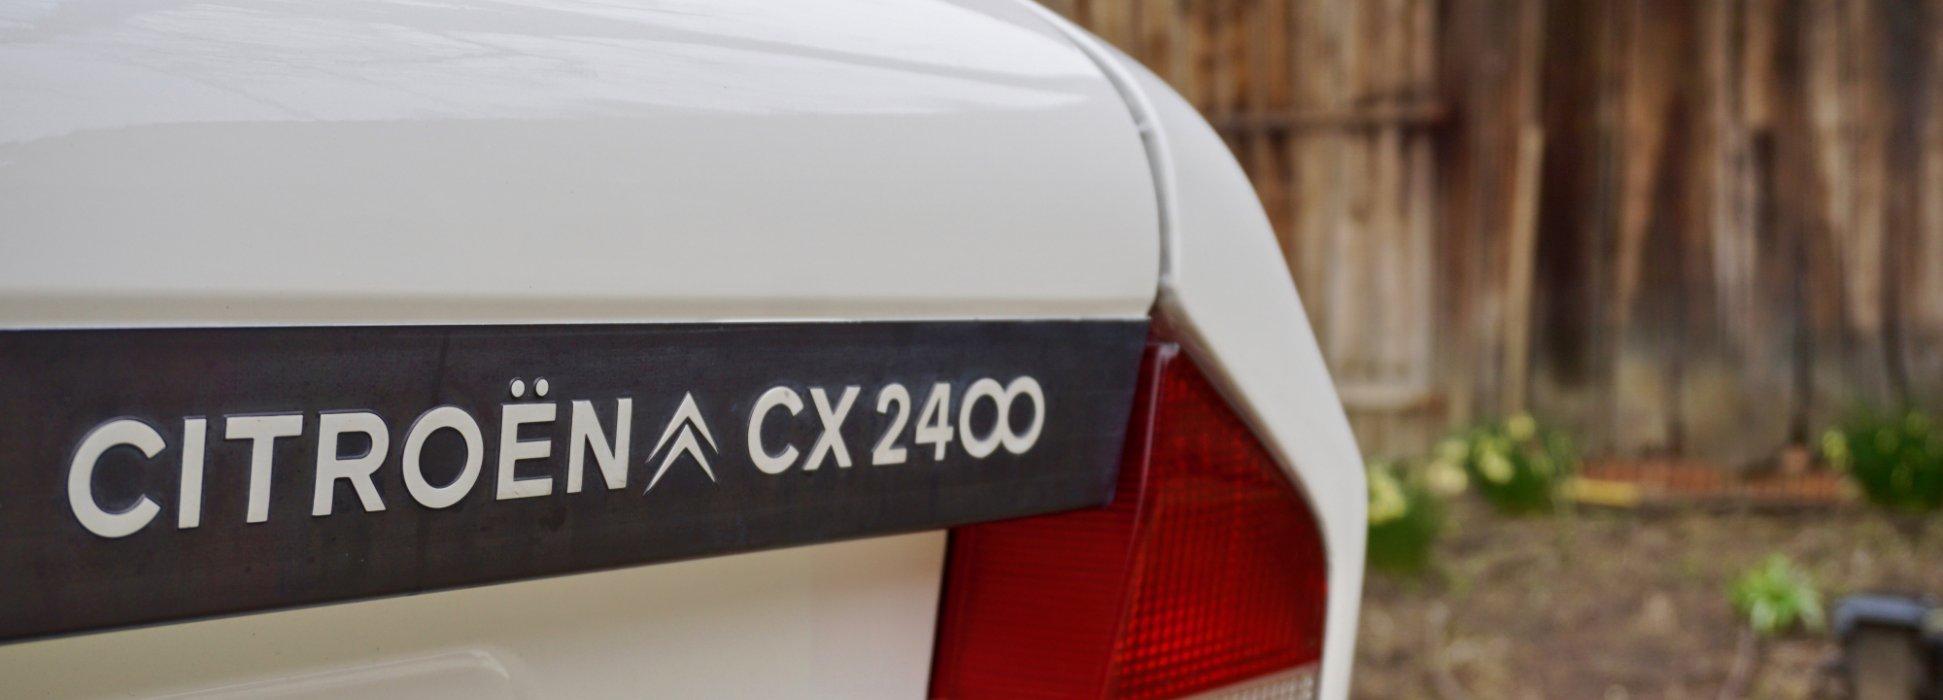 Citroën CX GTi 2400 1